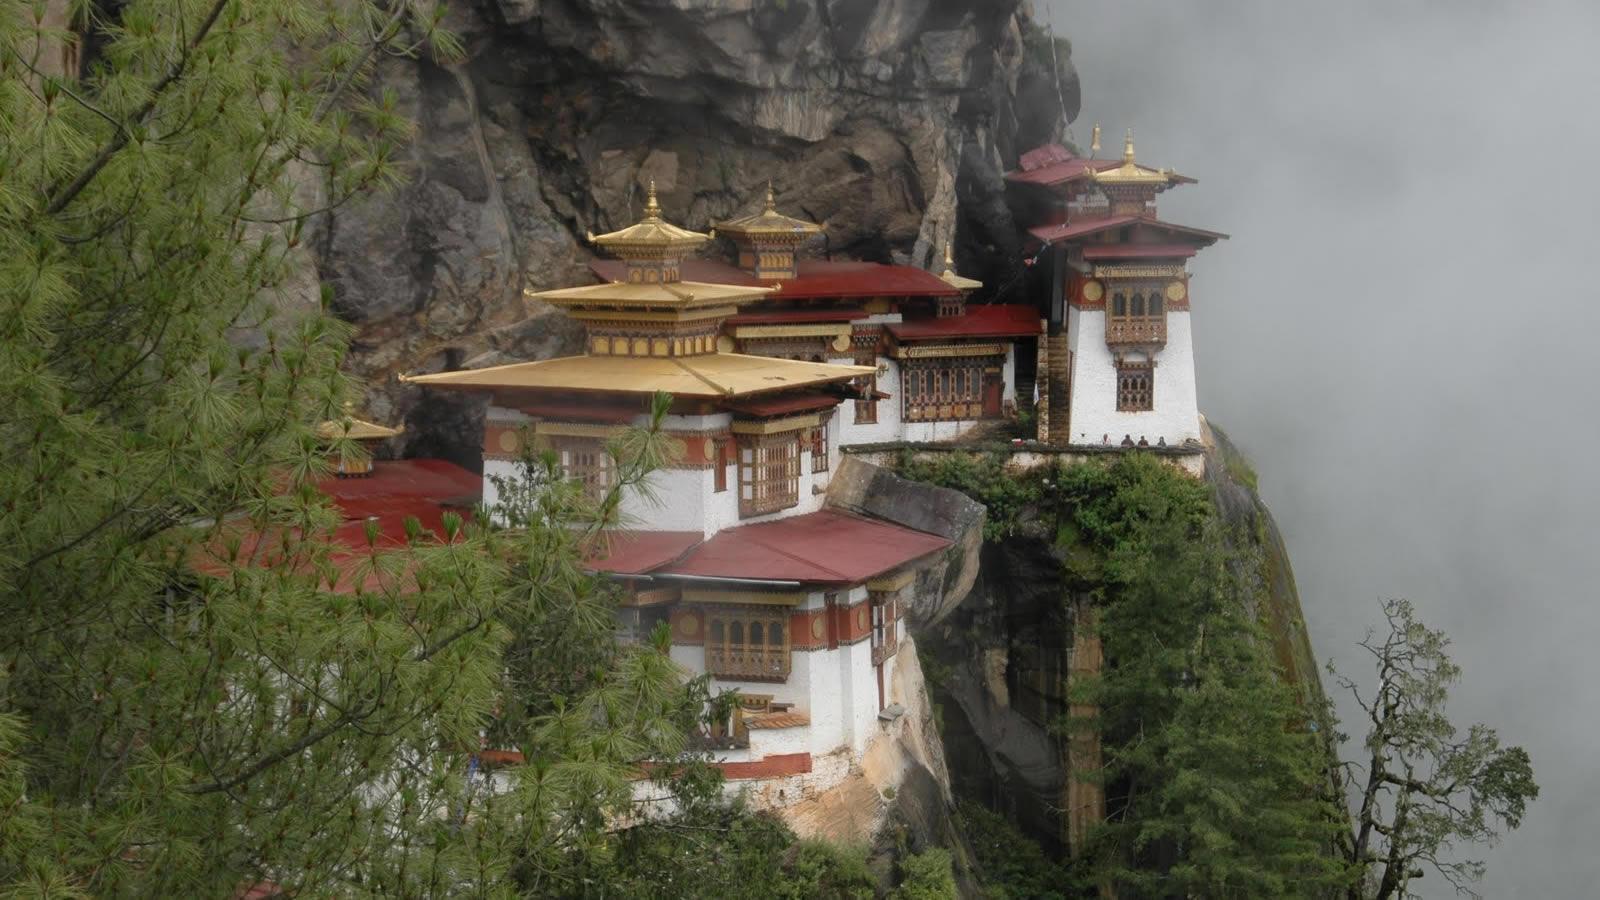 Taktsang Buddhist Monastery in Bhutan